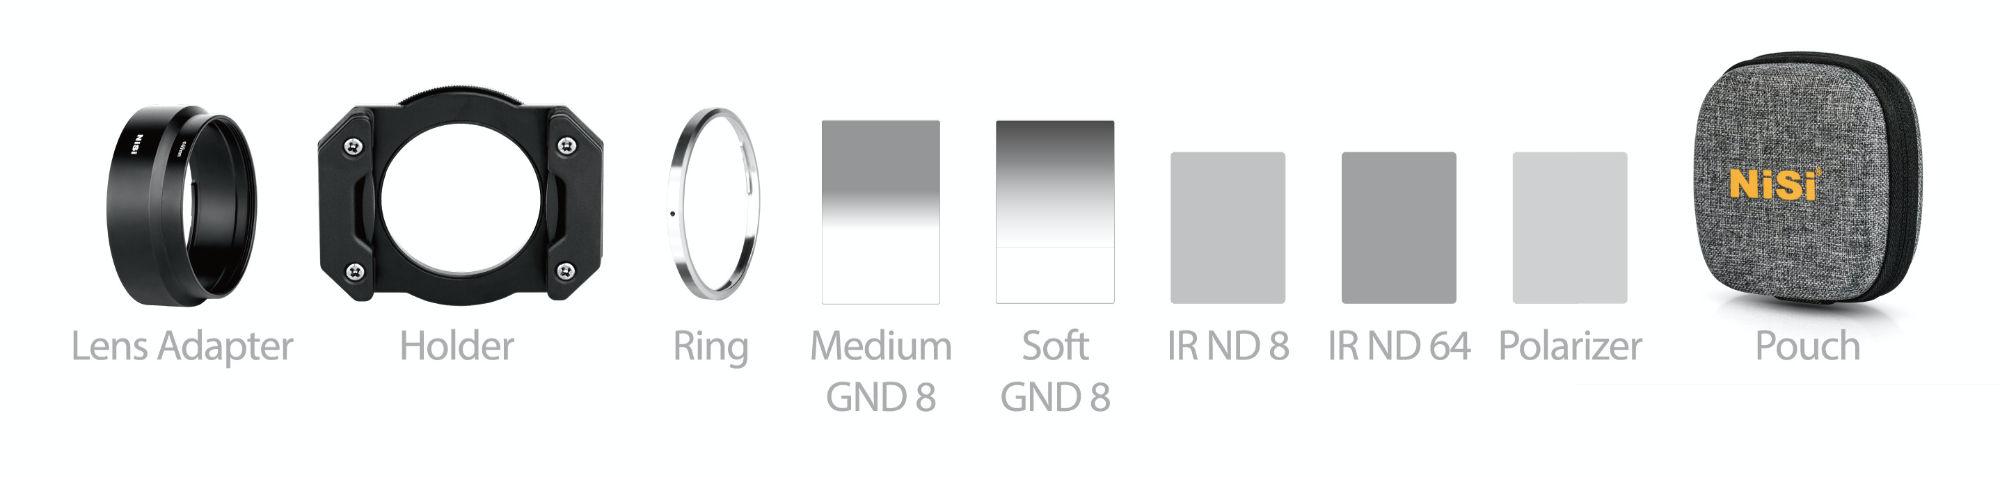 nisi-gr3-mater-kit-contents.jpg